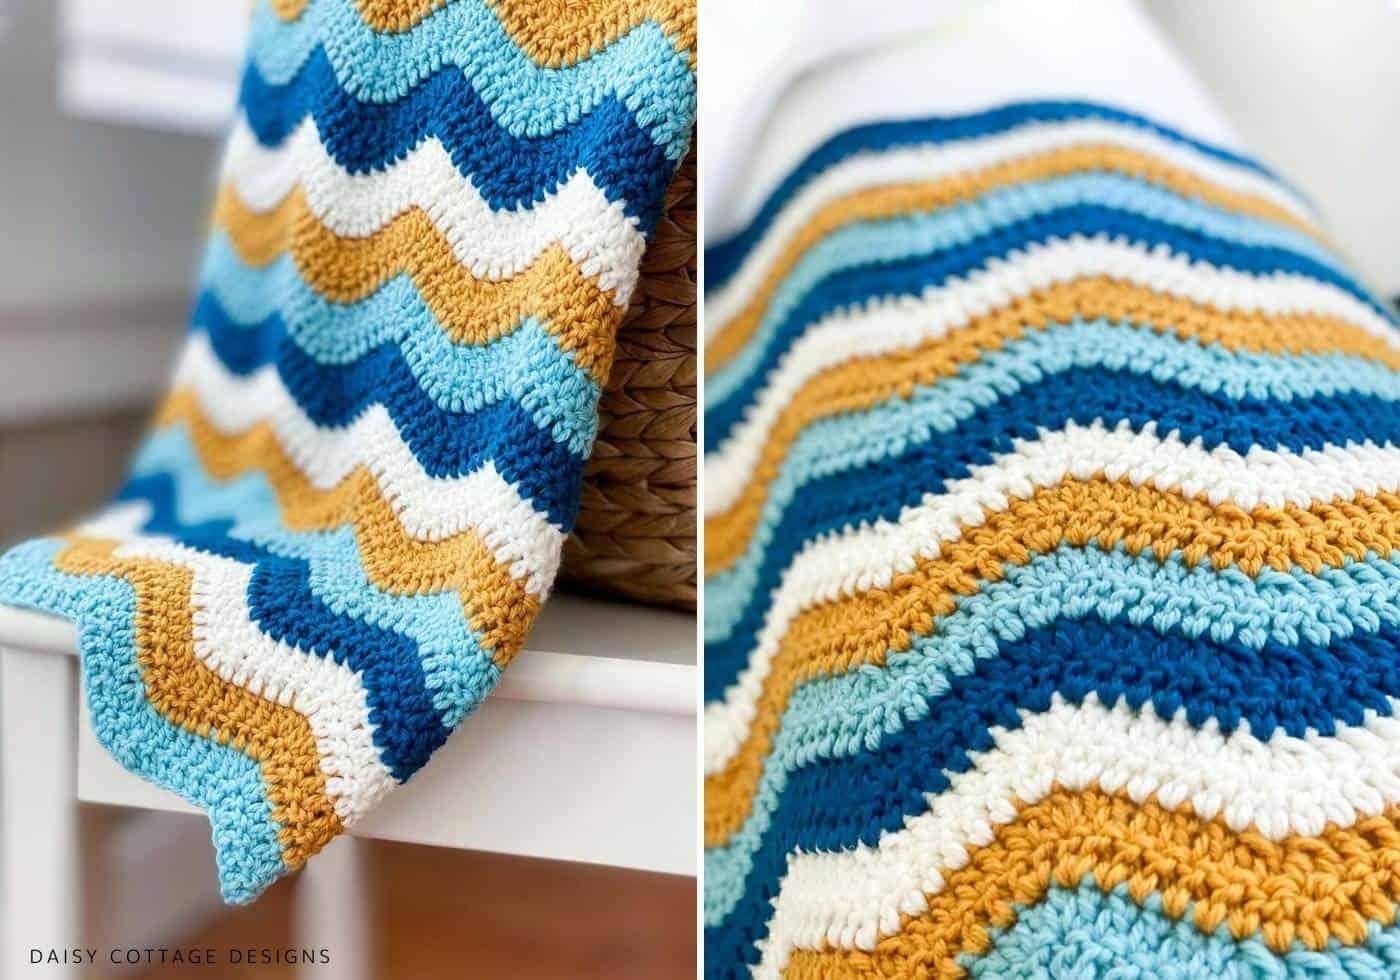 Crochet Ripple Blanket Wavy Blanket